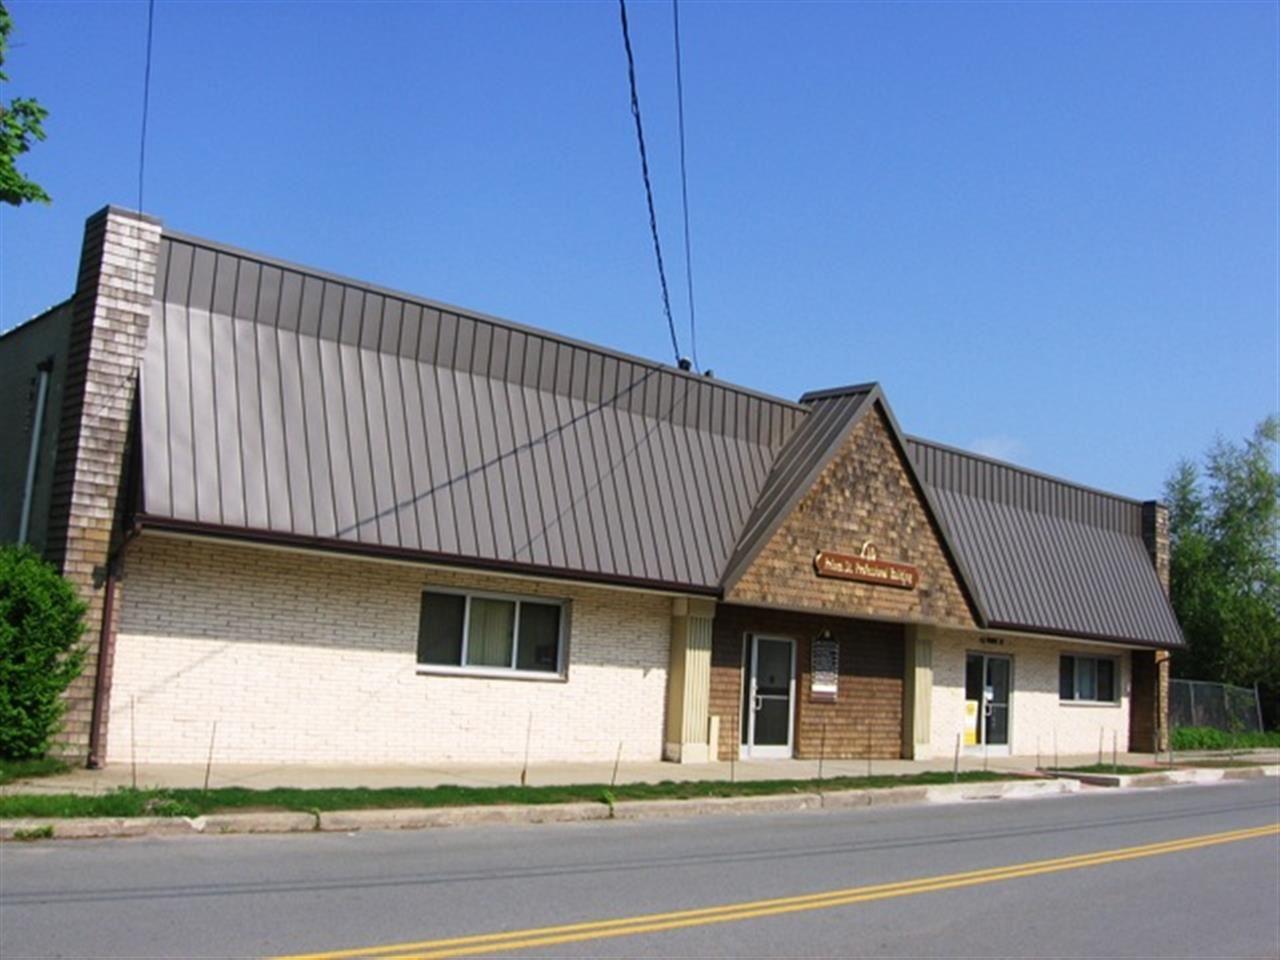 Rental Homes for Rent, ListingId:31767836, location: 10 Prince Street Monticello 12701